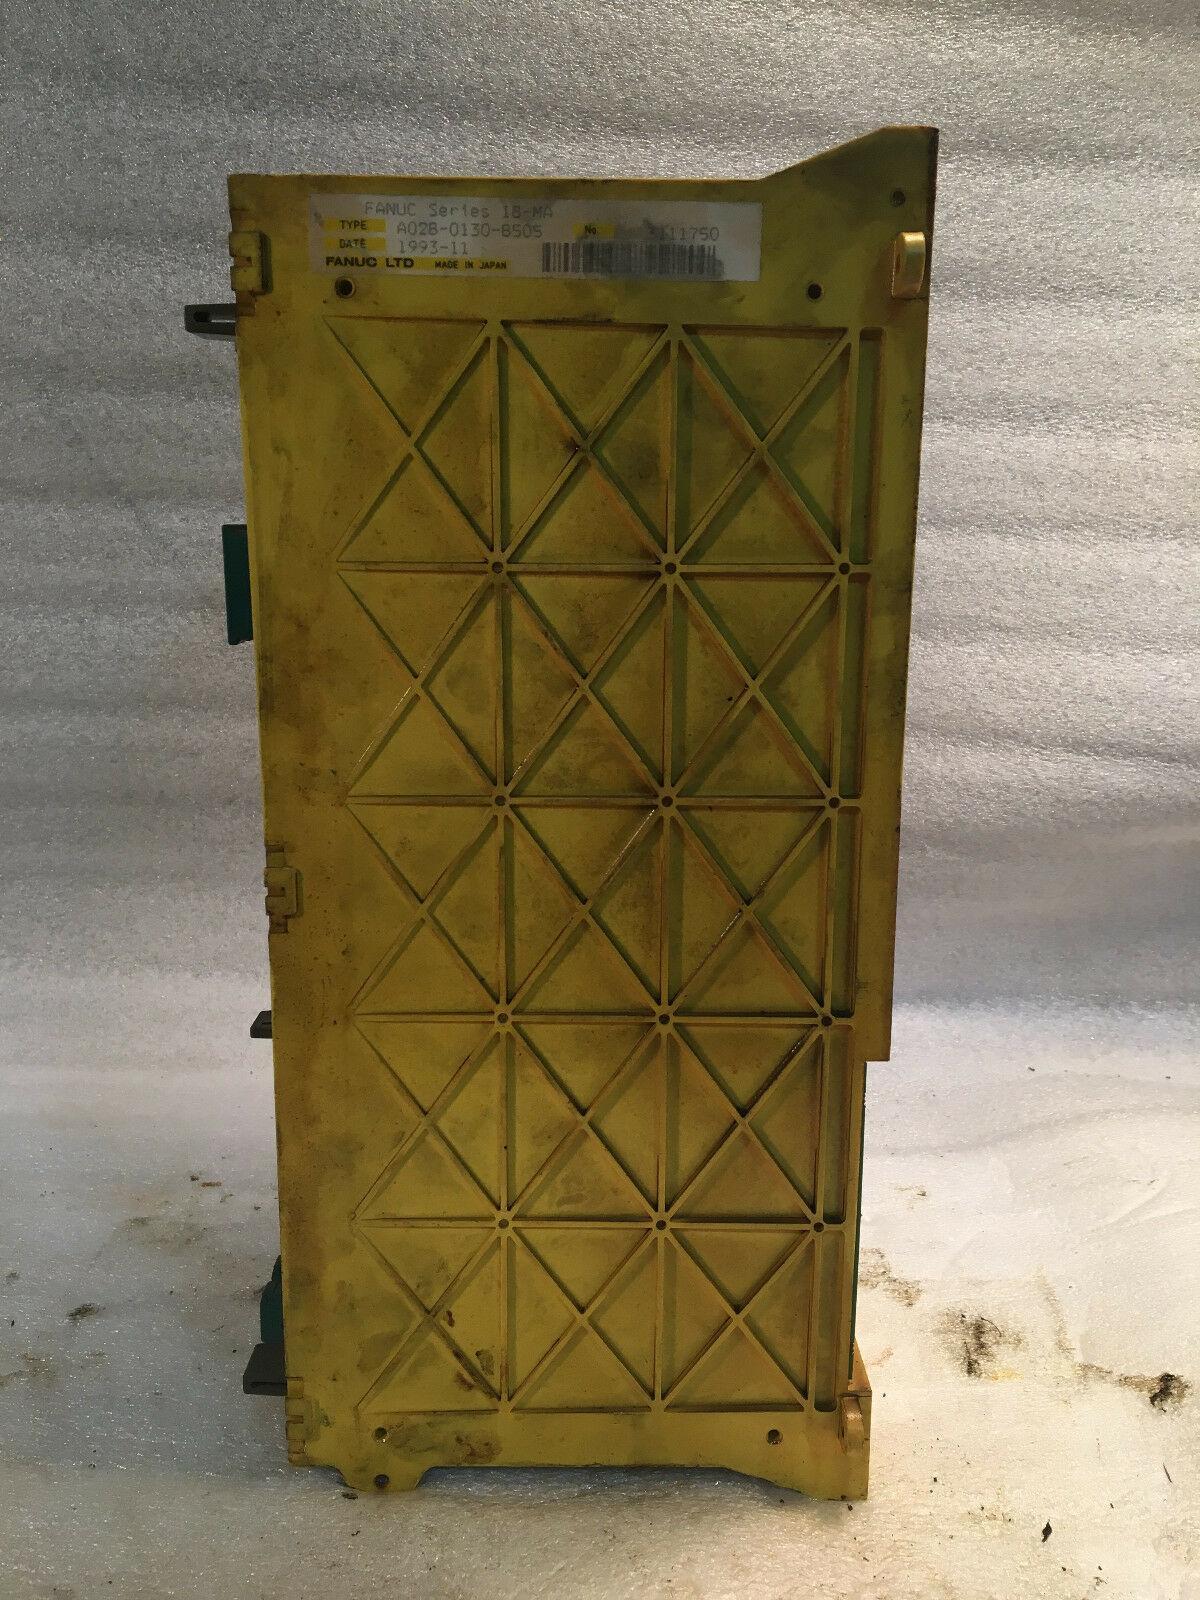 FANUC Series 18-MA Control Unit, Type: A02B-0130-B505 with A16B 2200-0956 04A302767 PCB Card & A16B 2201-0080 06A303418 18 Control system series CPU pcb, & A16B 1212-0531 06B303063 Power supply board. No: 3111750, Date: 1993-11